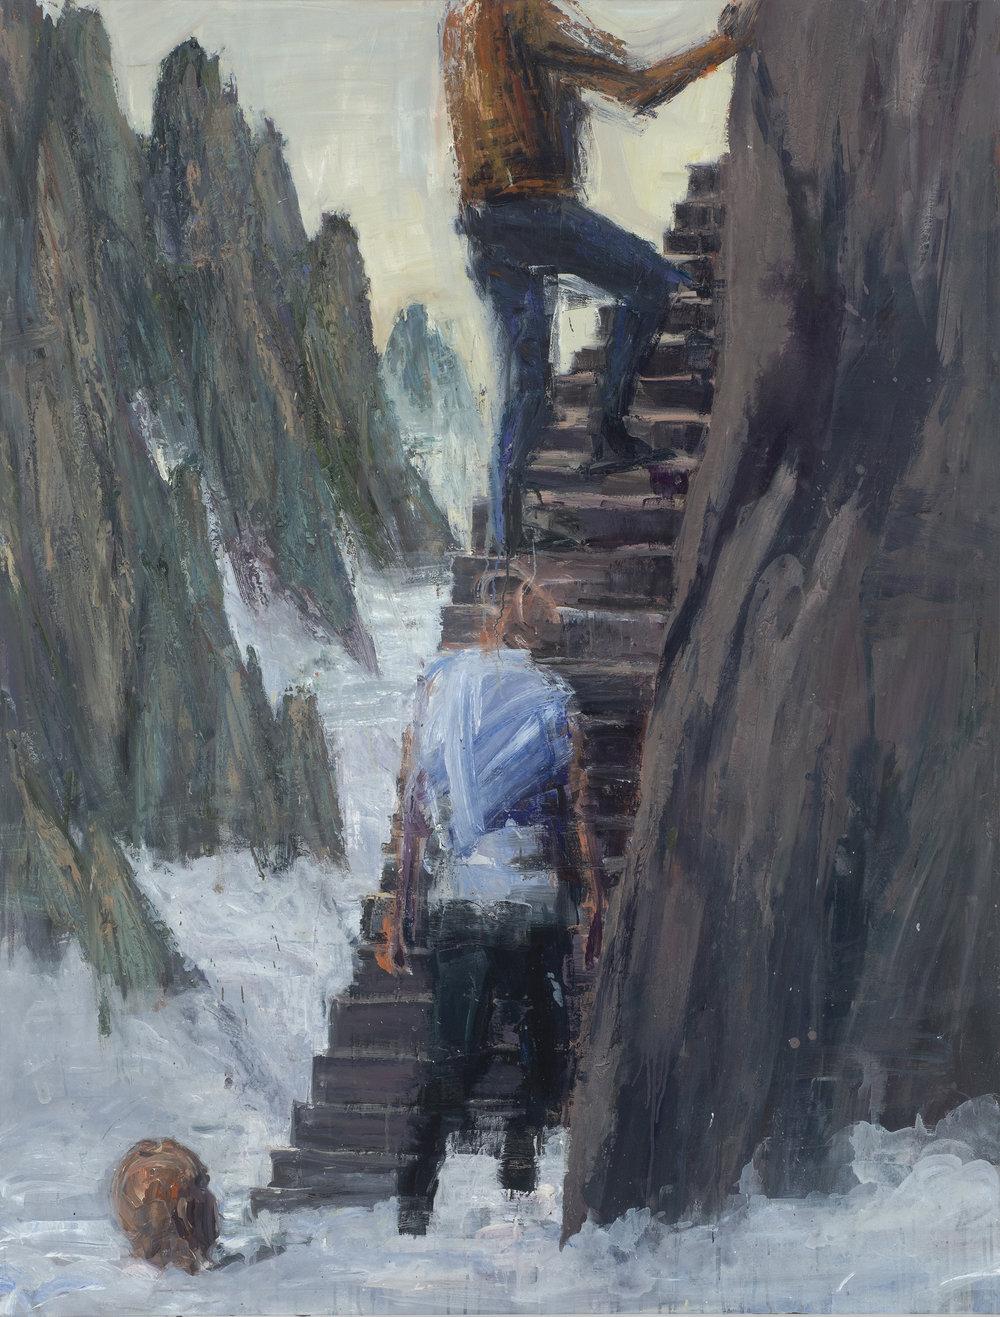 Climbing out of mist 在霧中拾級而上   Euan Macleod , 2016  Oil on acrylic on polyester, 18 x 137 cm, HKD 189,800